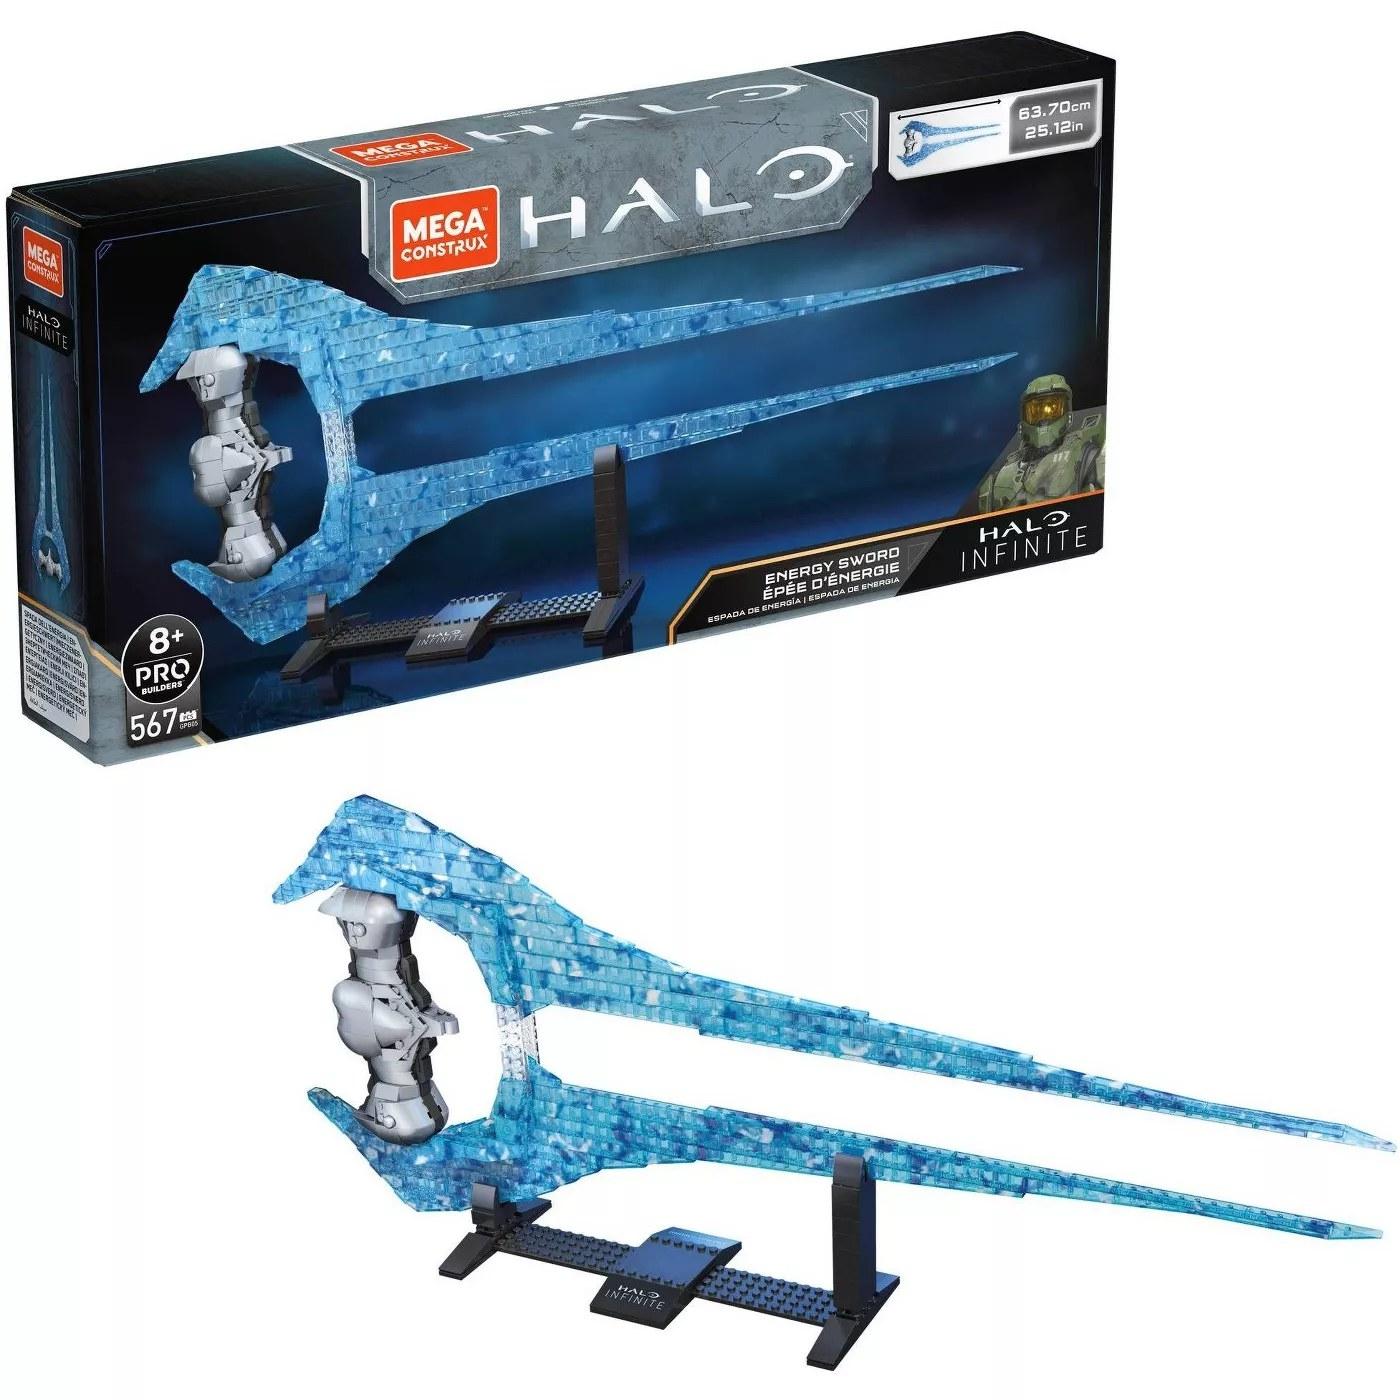 The Mega Construx Halo Infinite Energy Sword